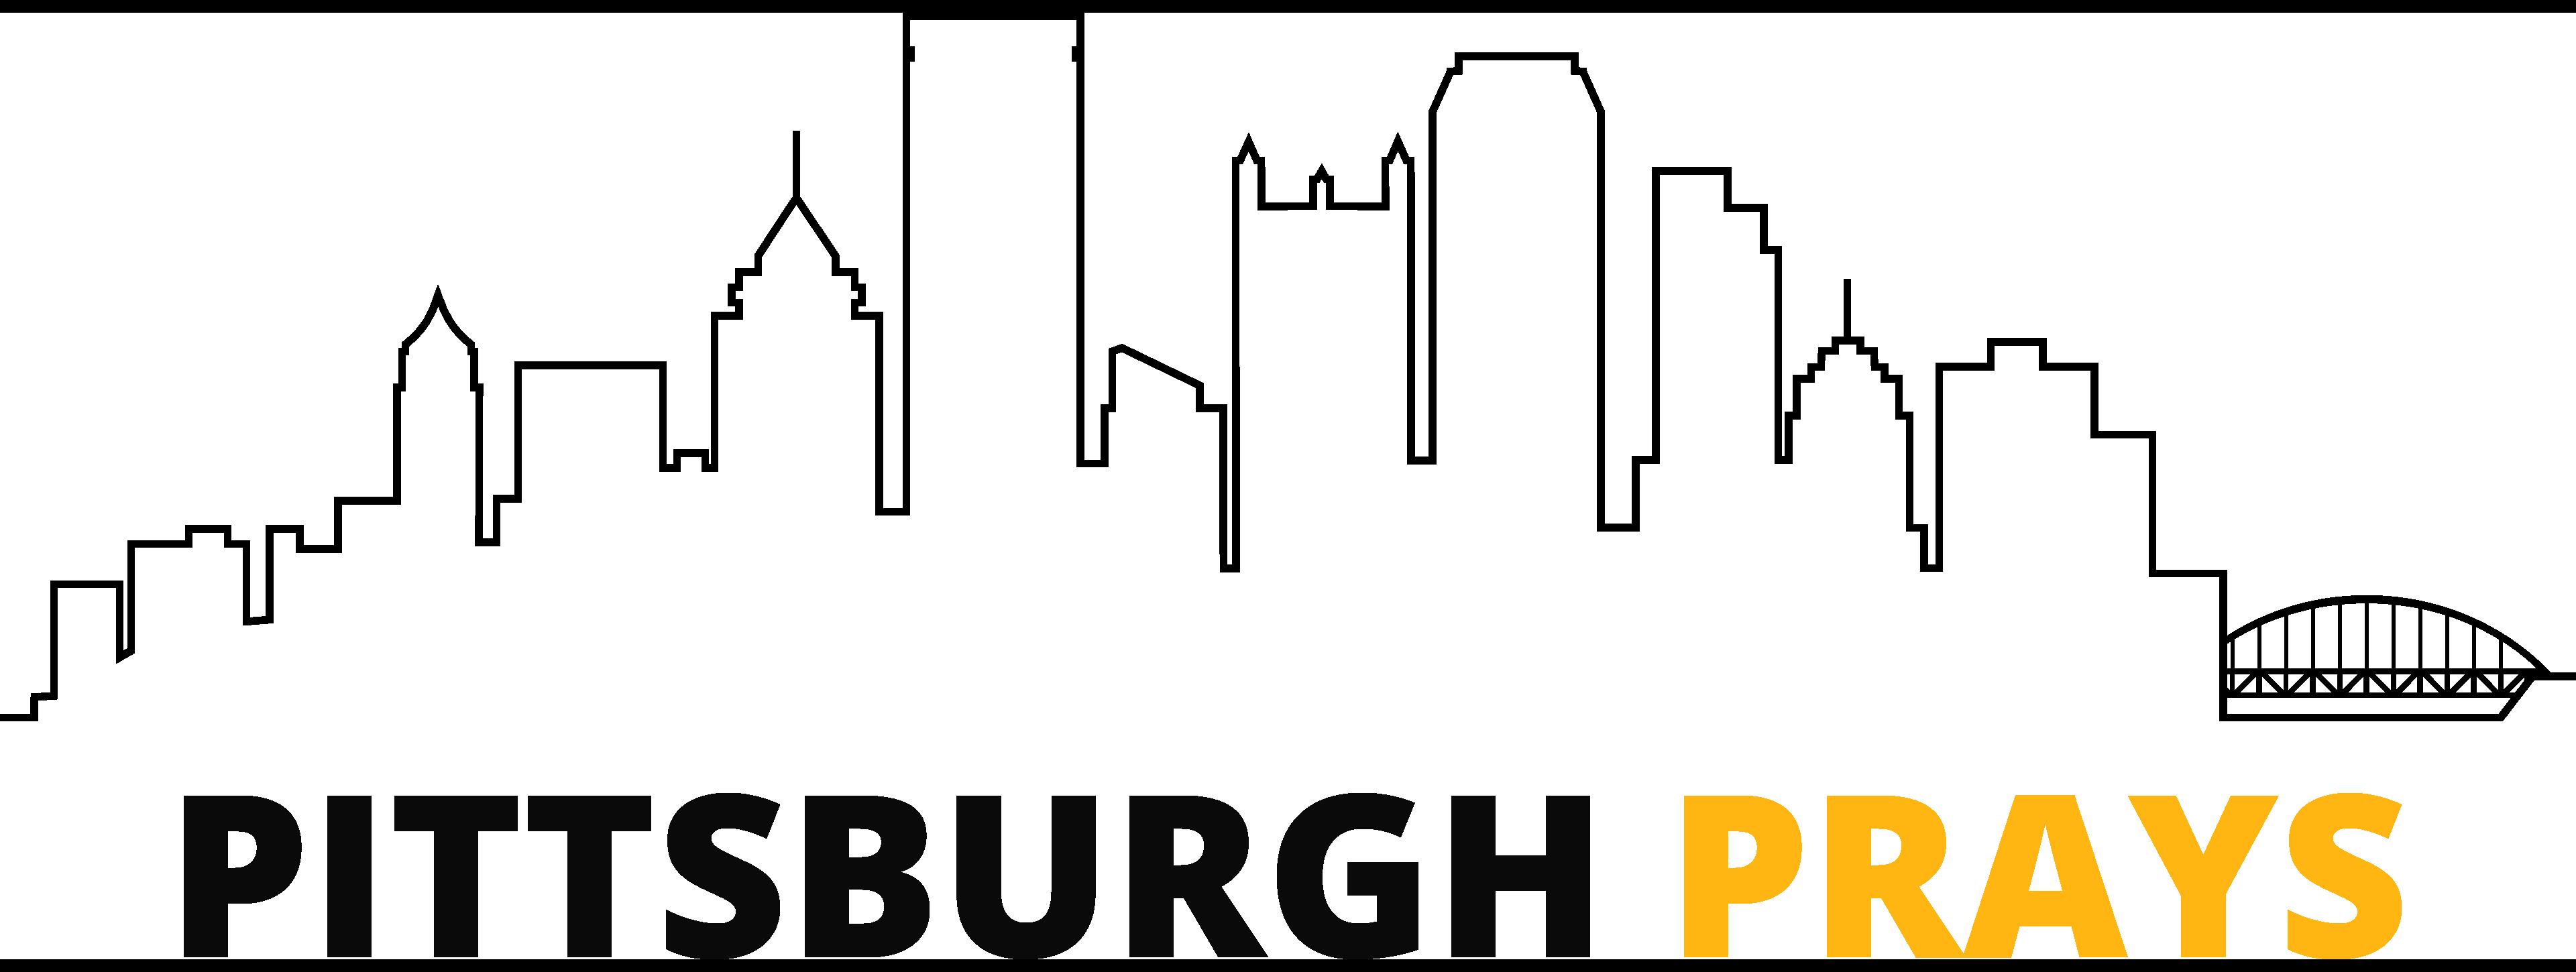 Pittsburgh Prays Wide